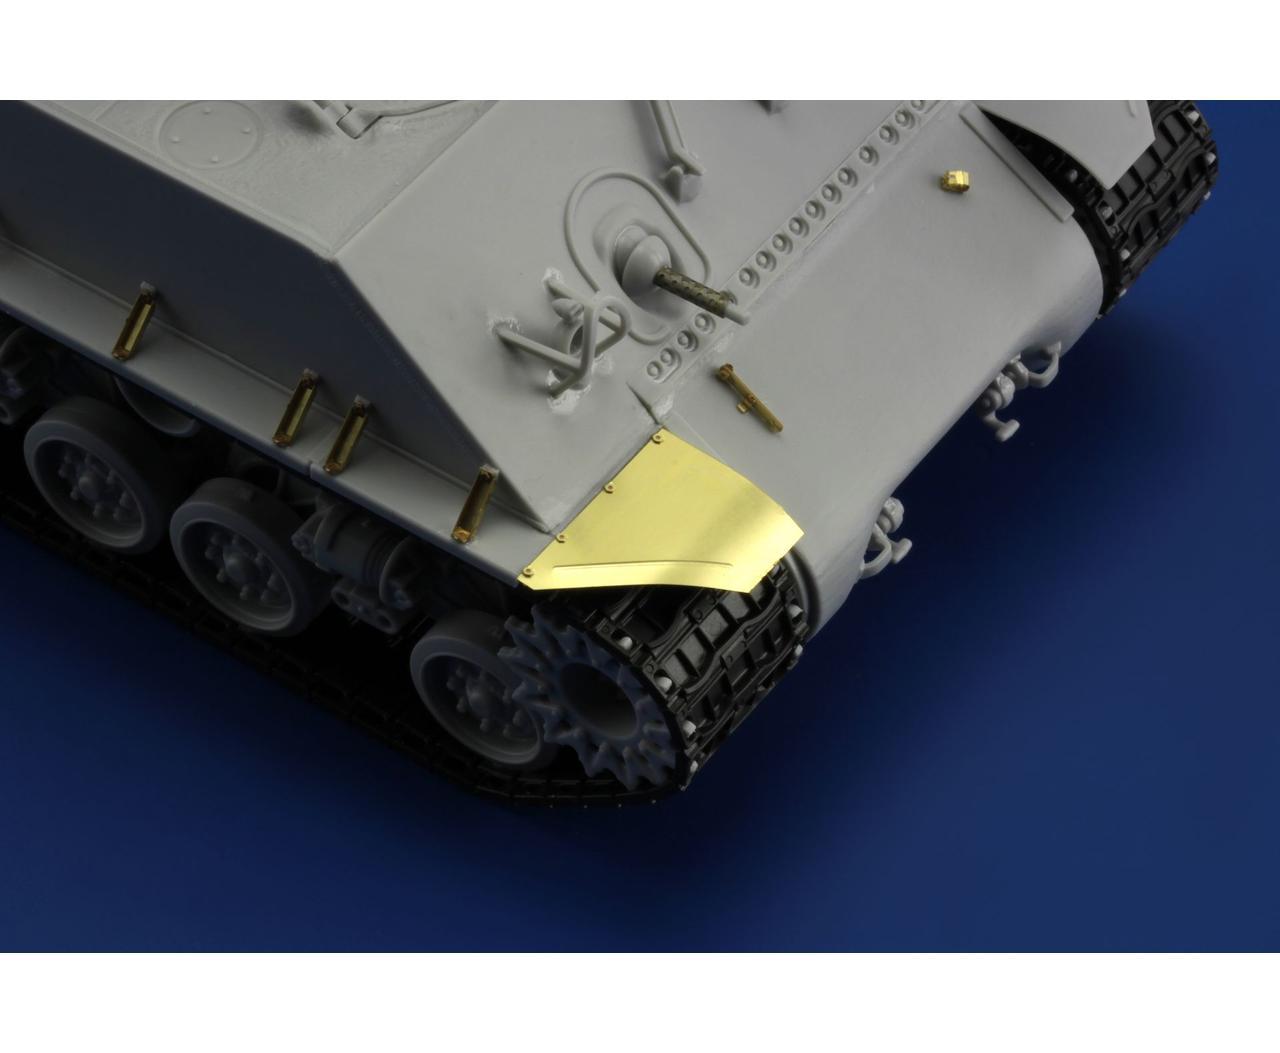 eduard 36334 1//35 Armor M4A3E8 detail set for Tamiya